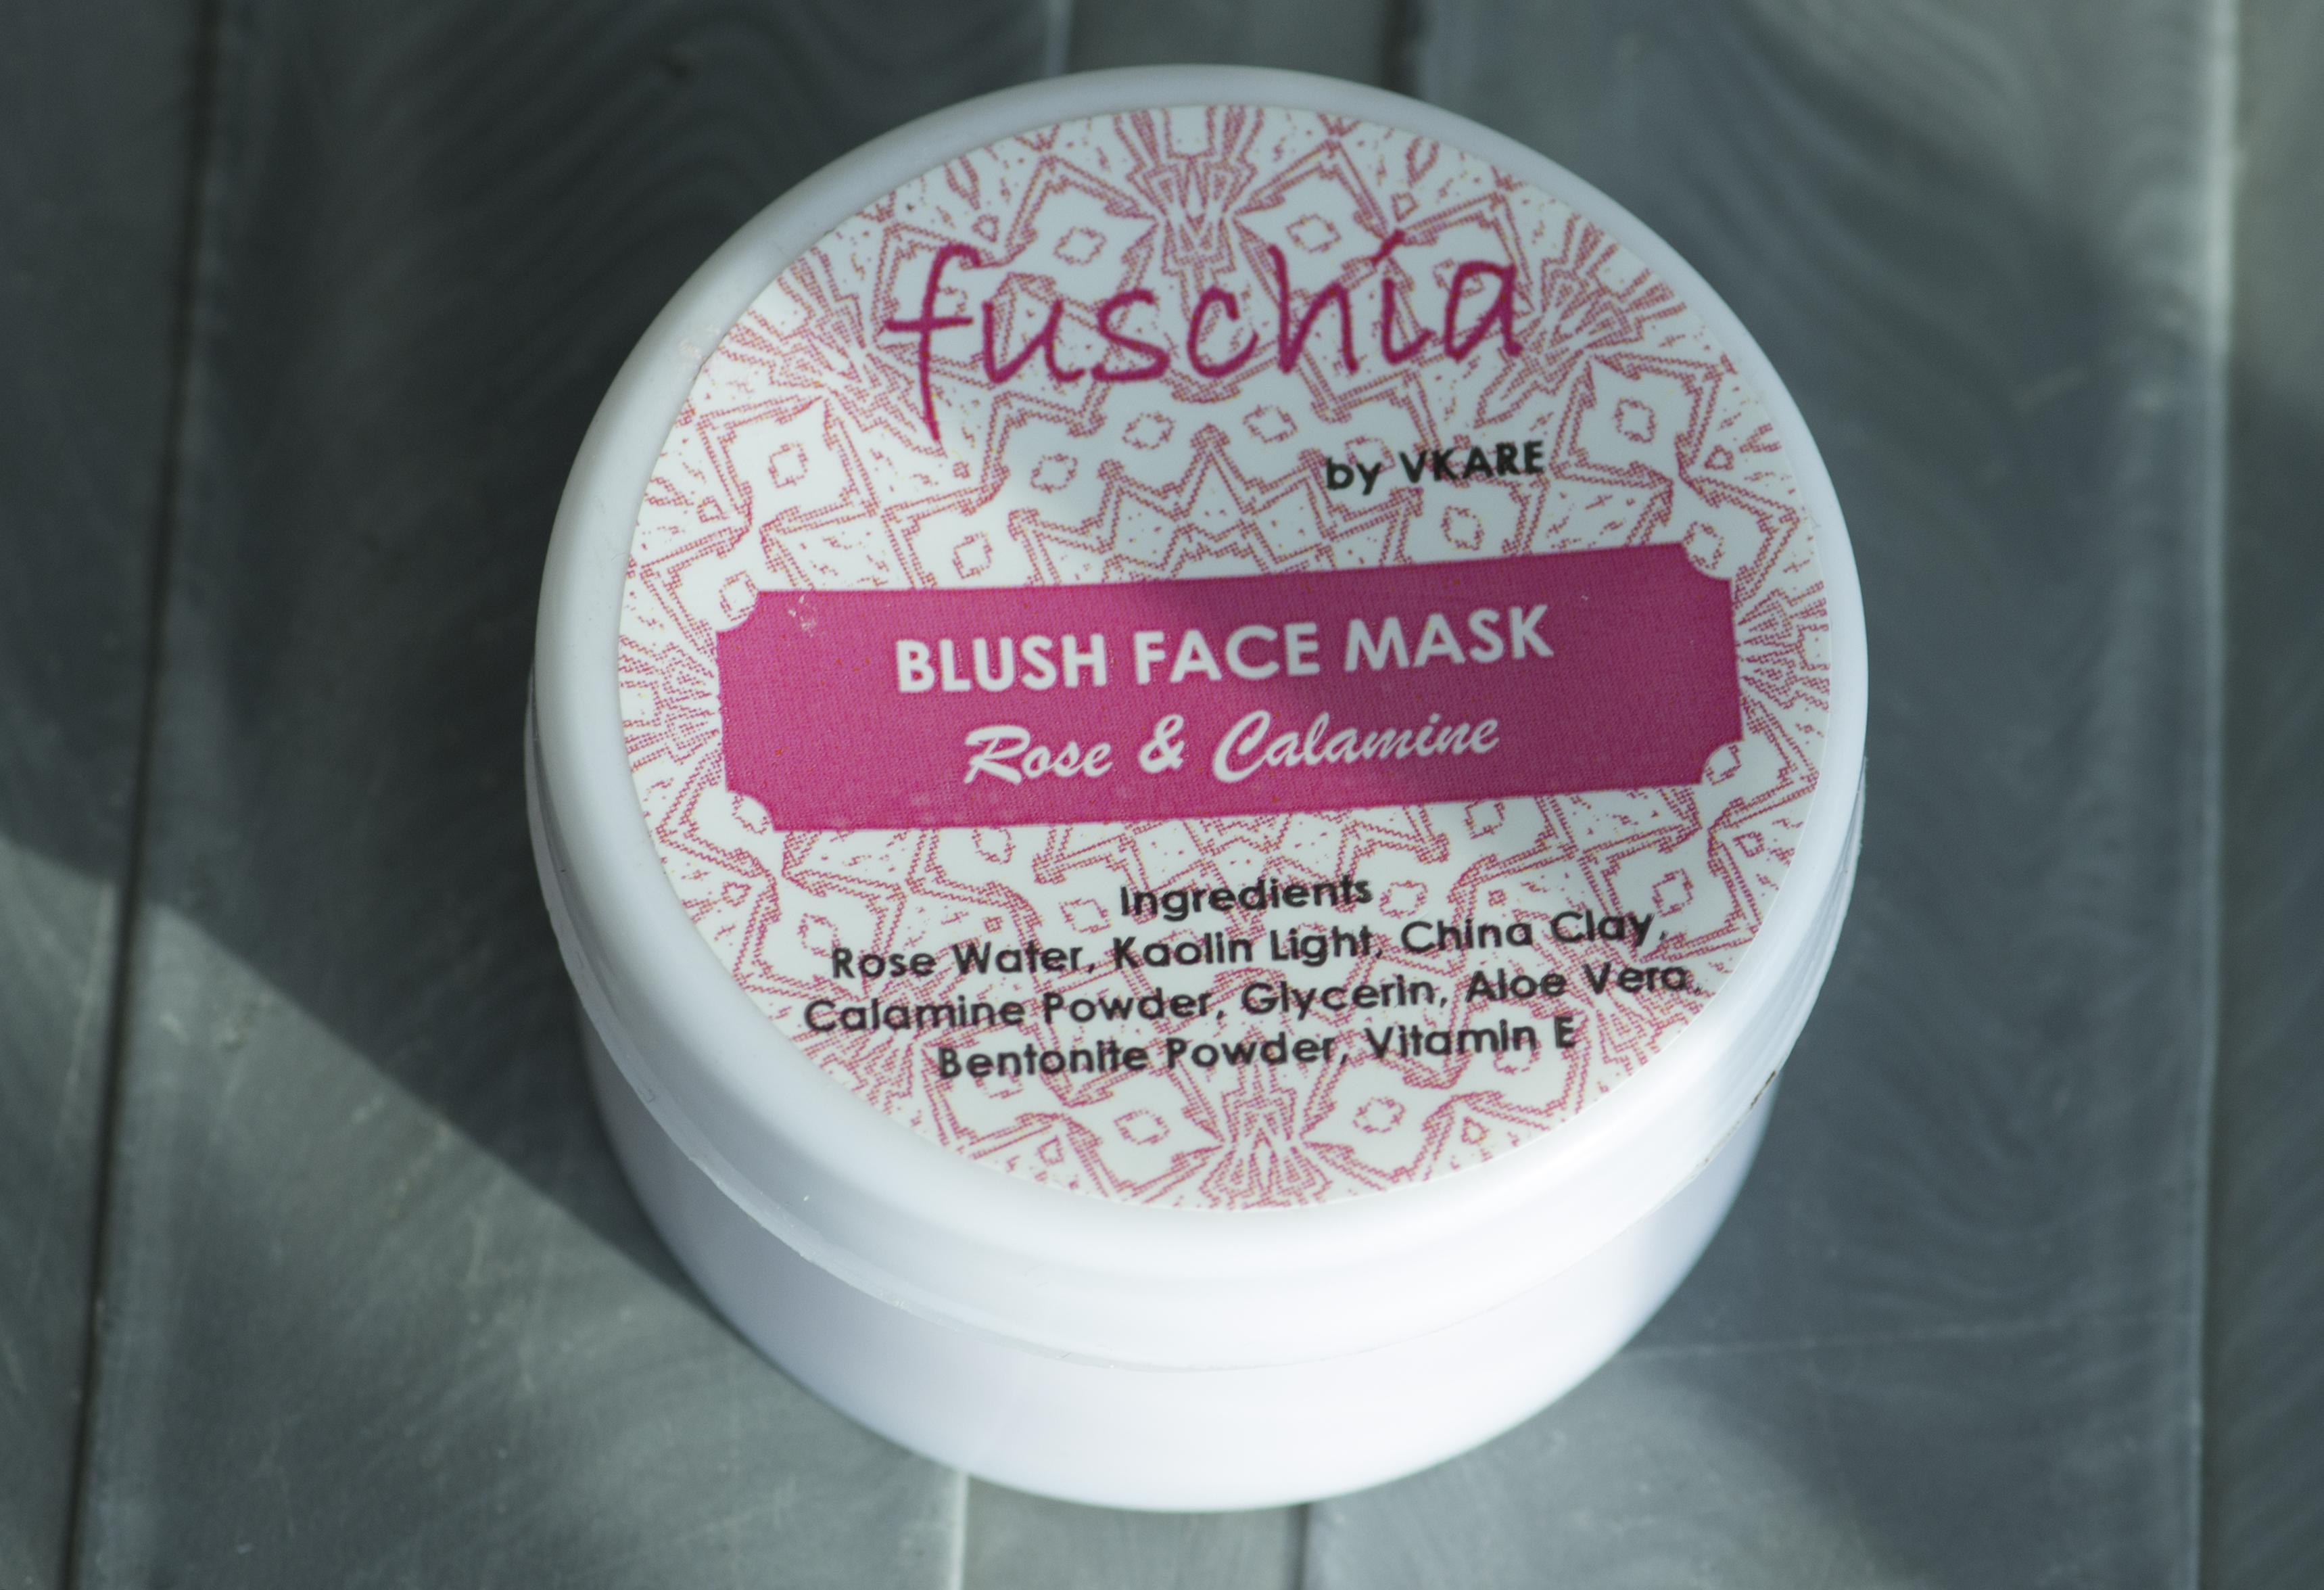 Fuscia Blush Face Mask Review